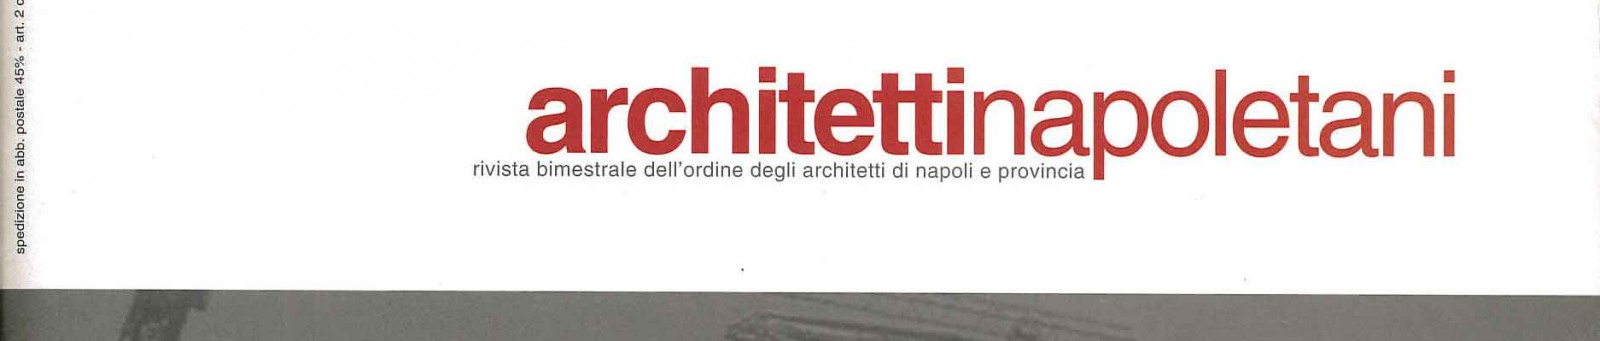 ARCHITETTI NAPOLETANI_FRONT_low